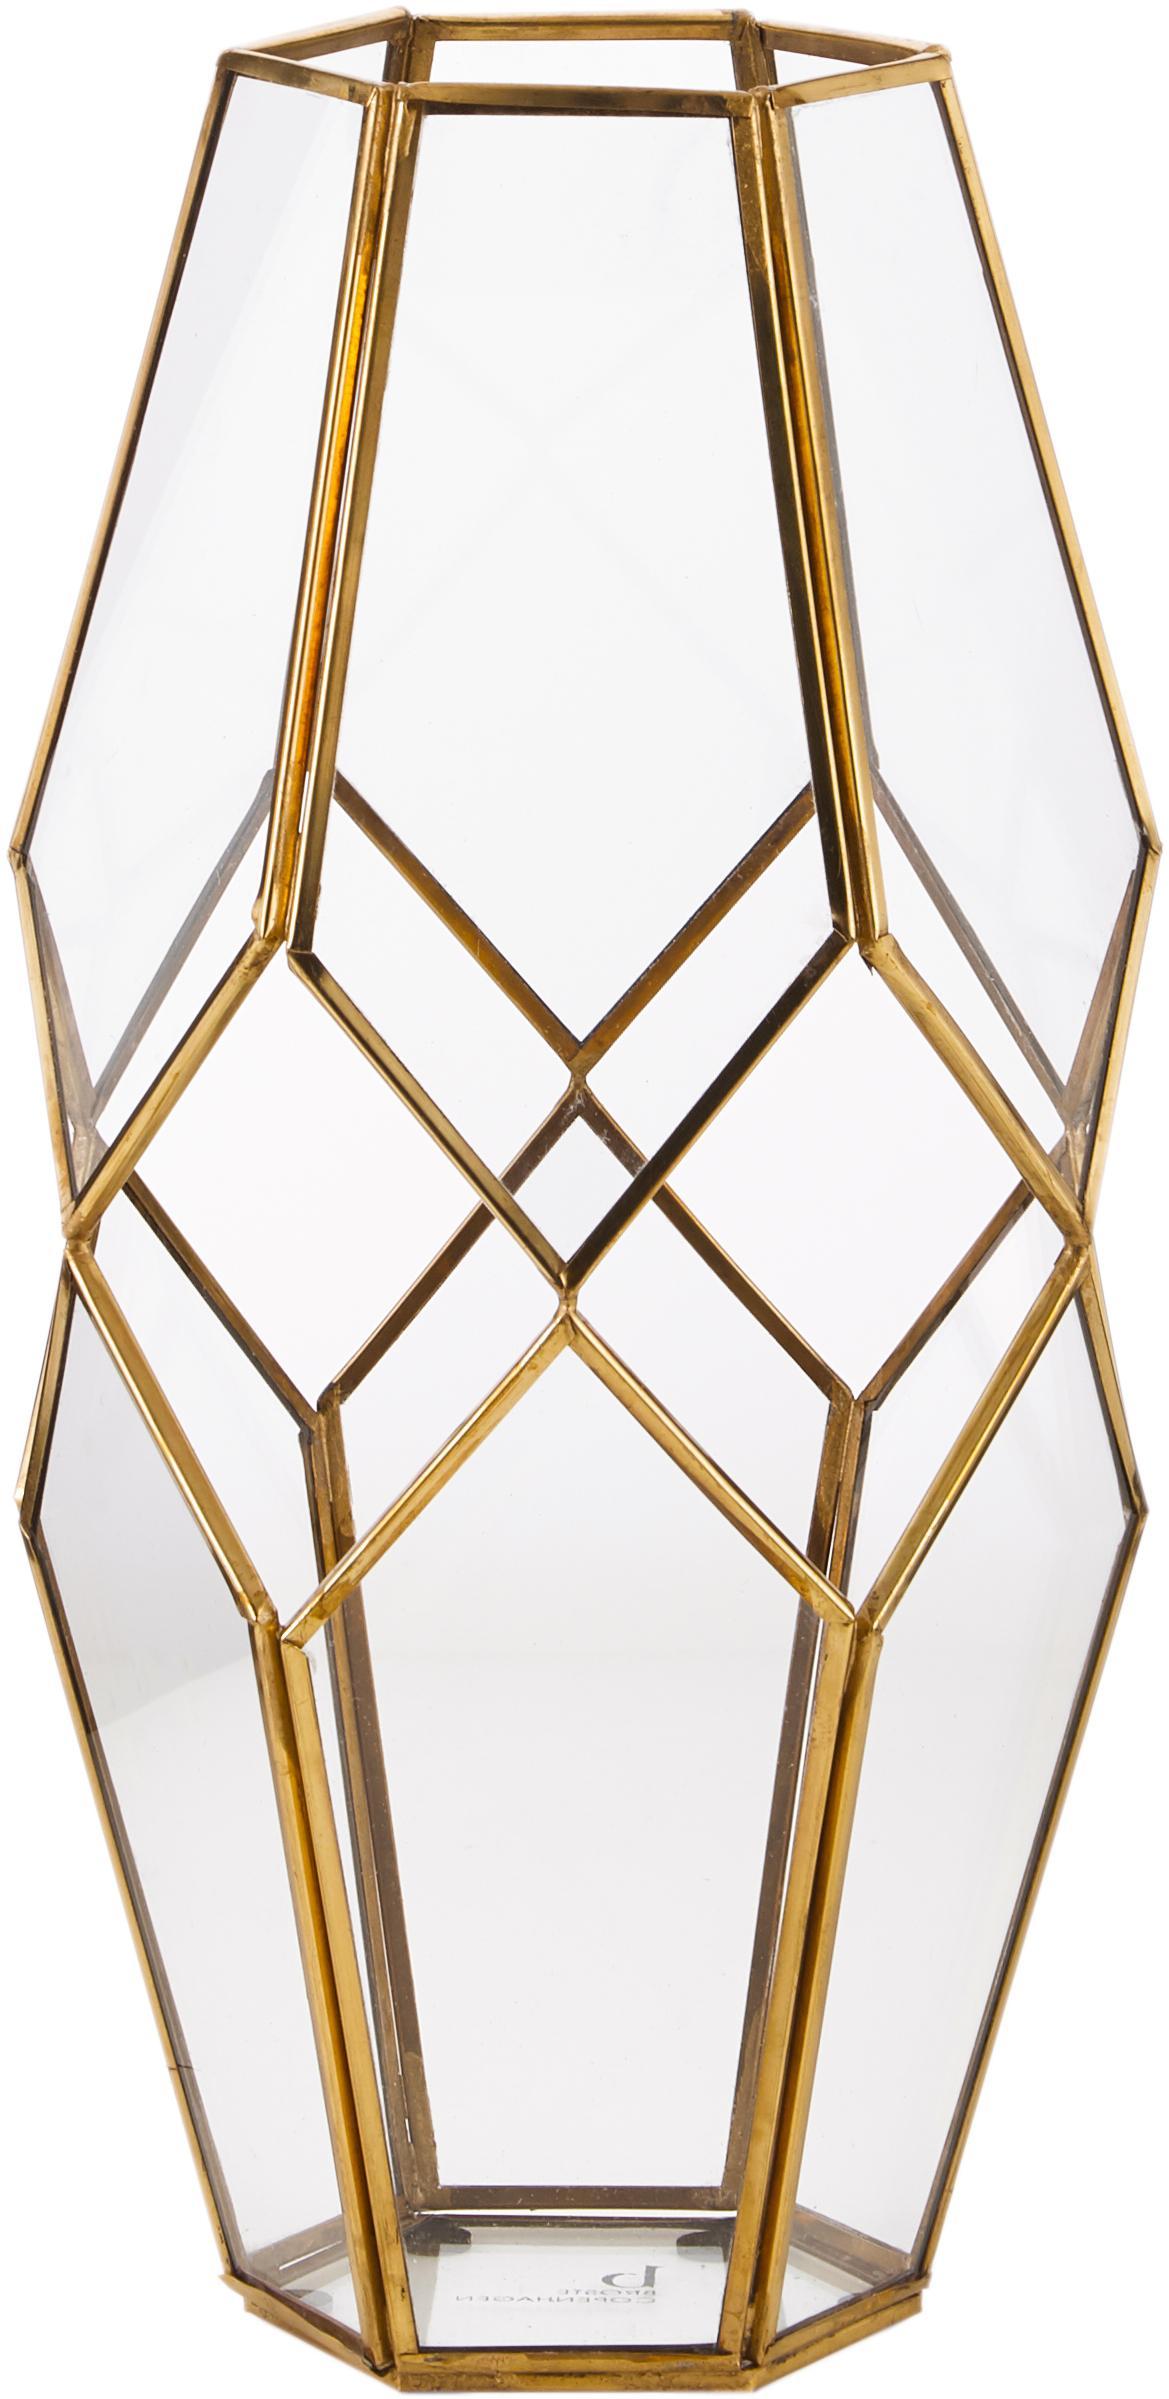 Windlicht Peter, Messing, glas, Transparant, messingkleurig, H 33 cm